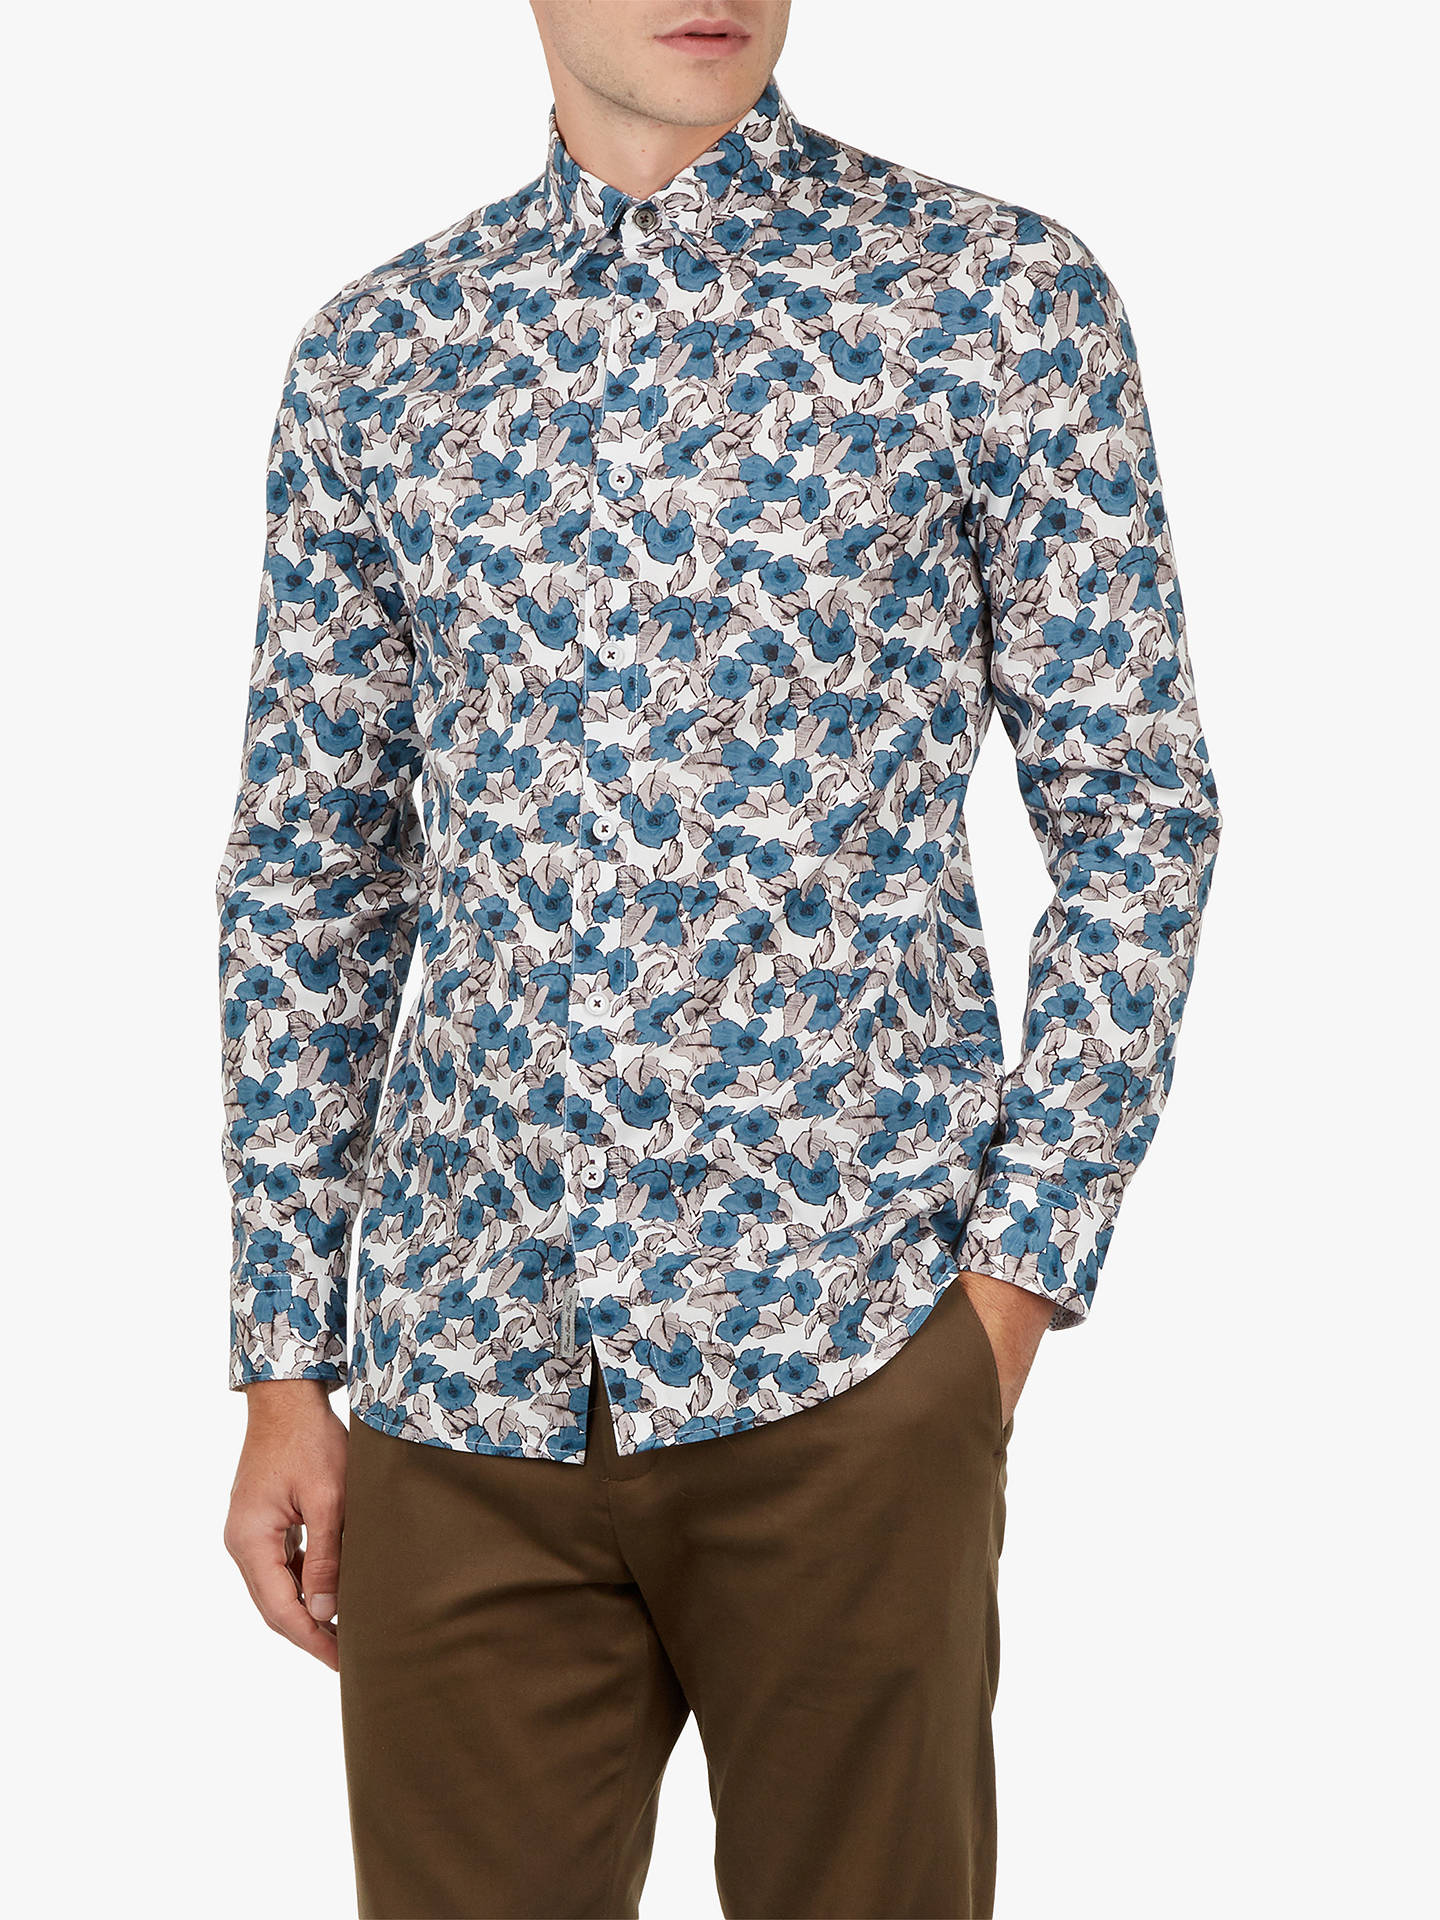 7ab3aaff Buy Ted Baker Croydon Long Sleeve Floral Shirt, Blue, 14.5 Online at  johnlewis.